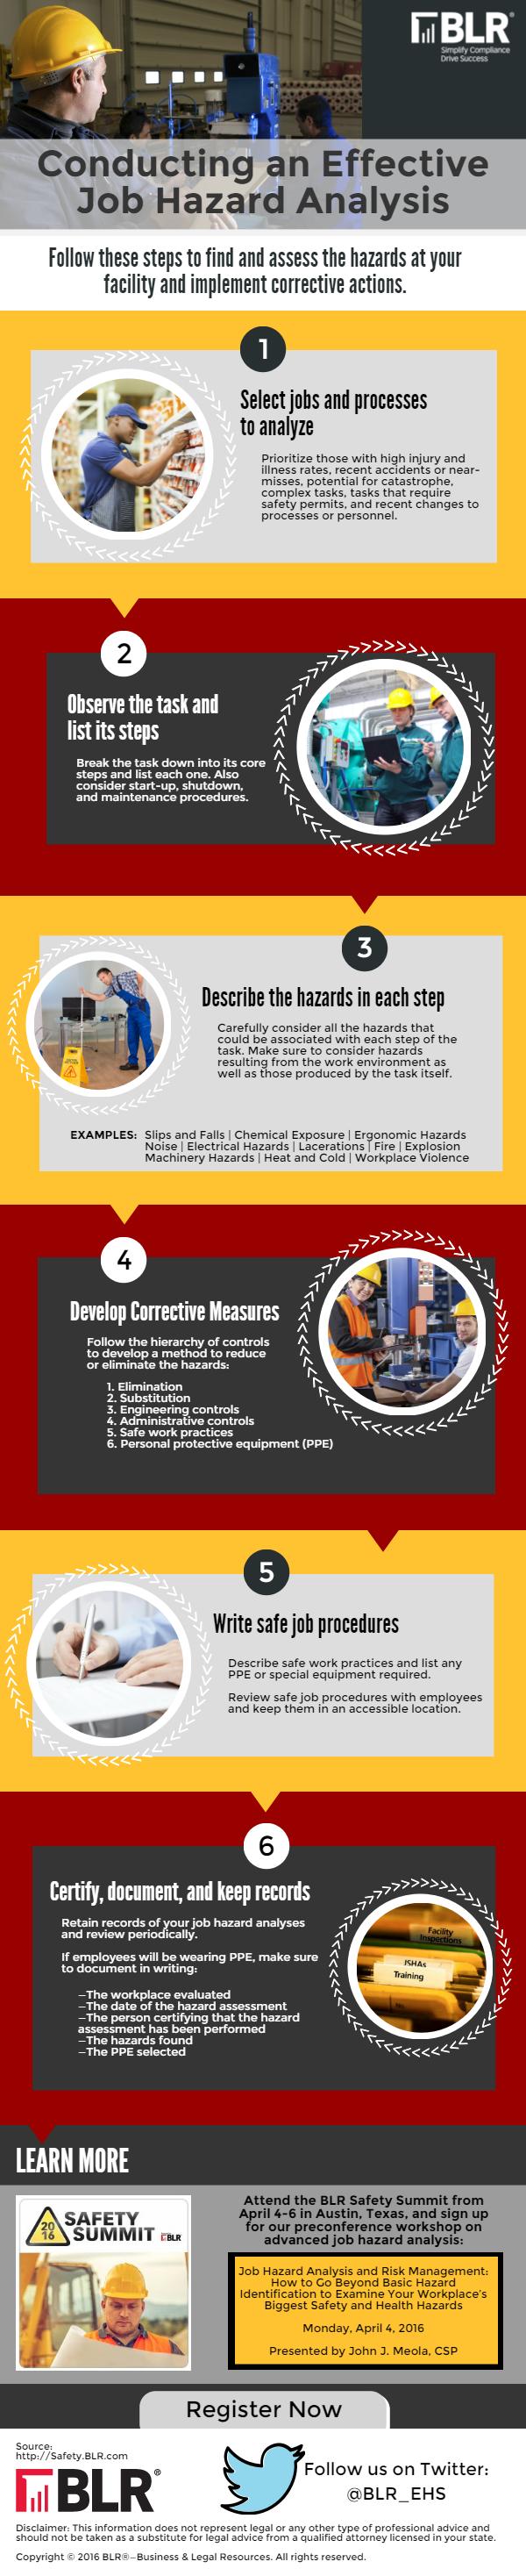 Infographic Conducting an effective job hazard analysis